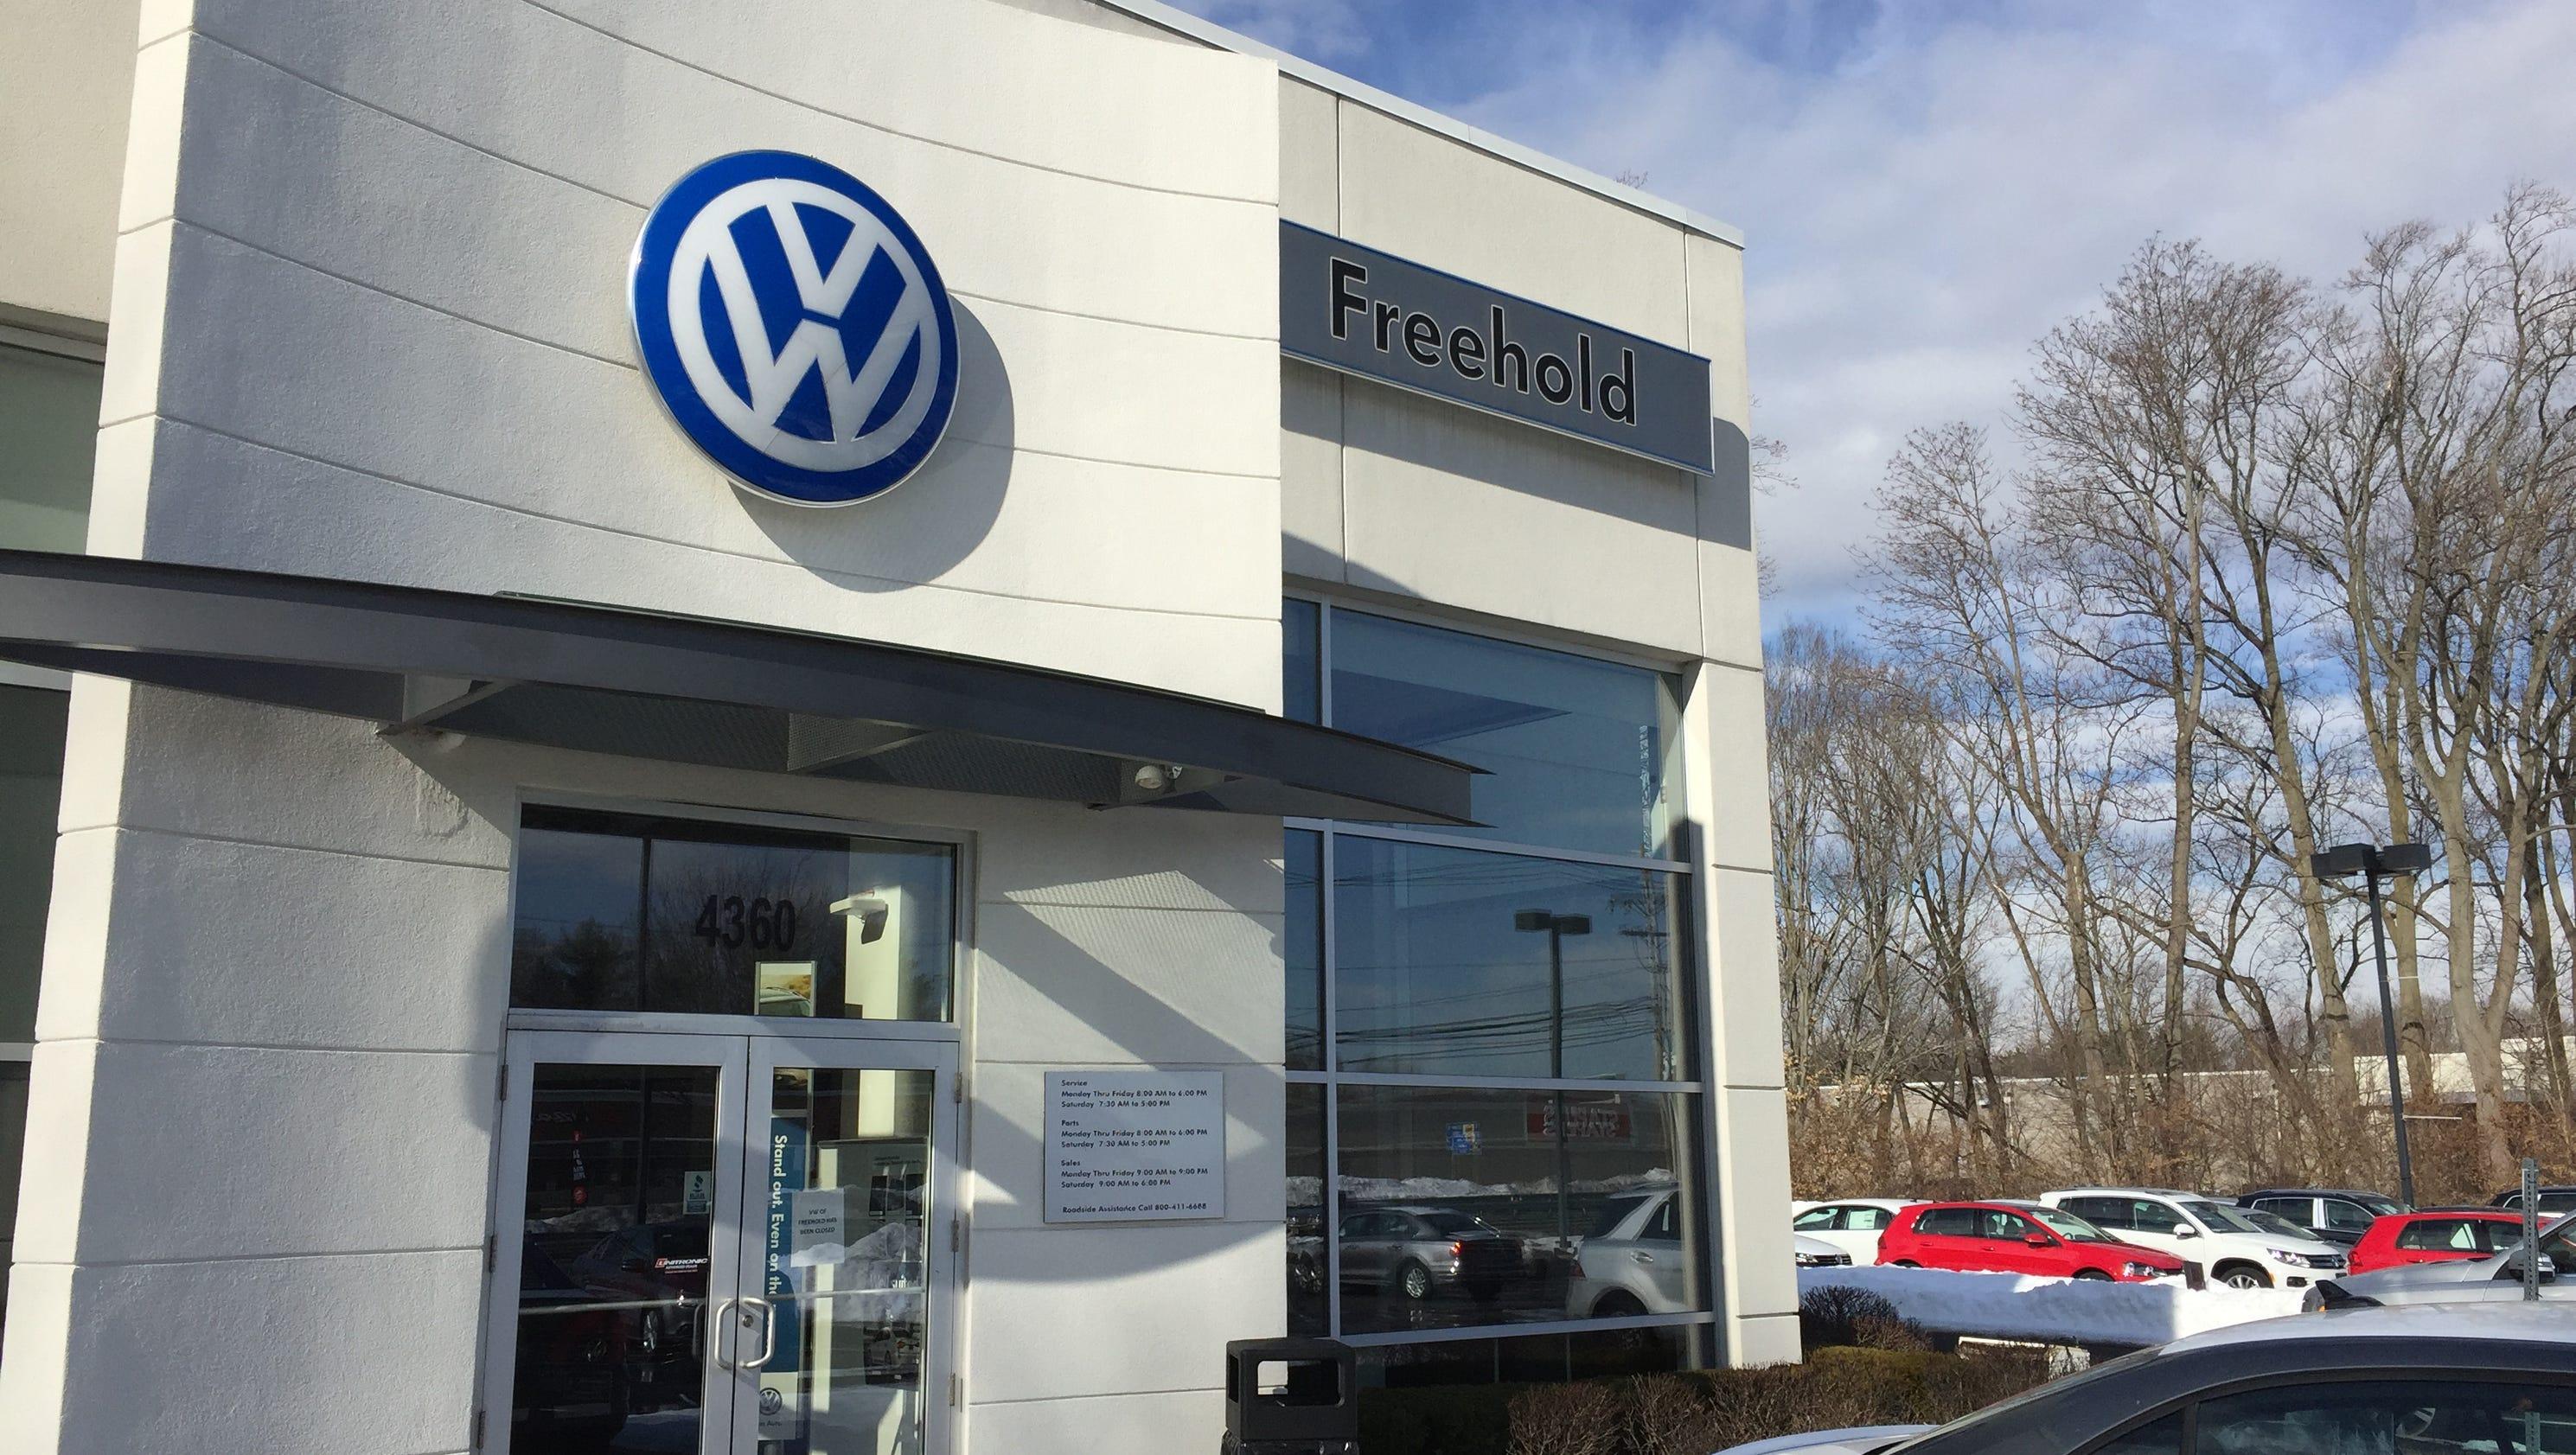 Volkswagen freehold 2017 2018 2019 volkswagen reviews for Honda of freehold service